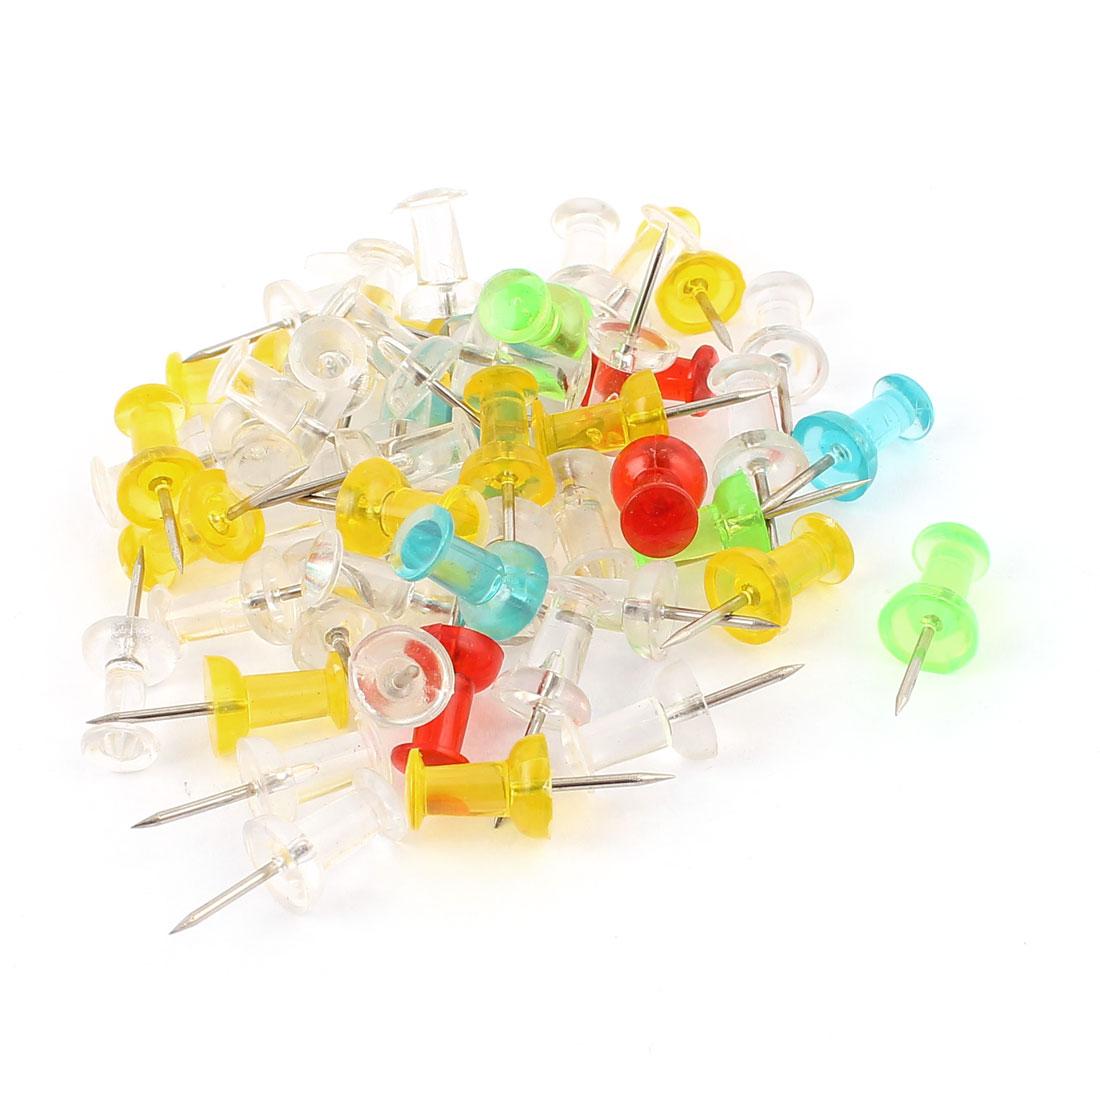 Office Plastic Head Thumb Tack Push Pins Bulletin Board Holder Colorful 50pcs